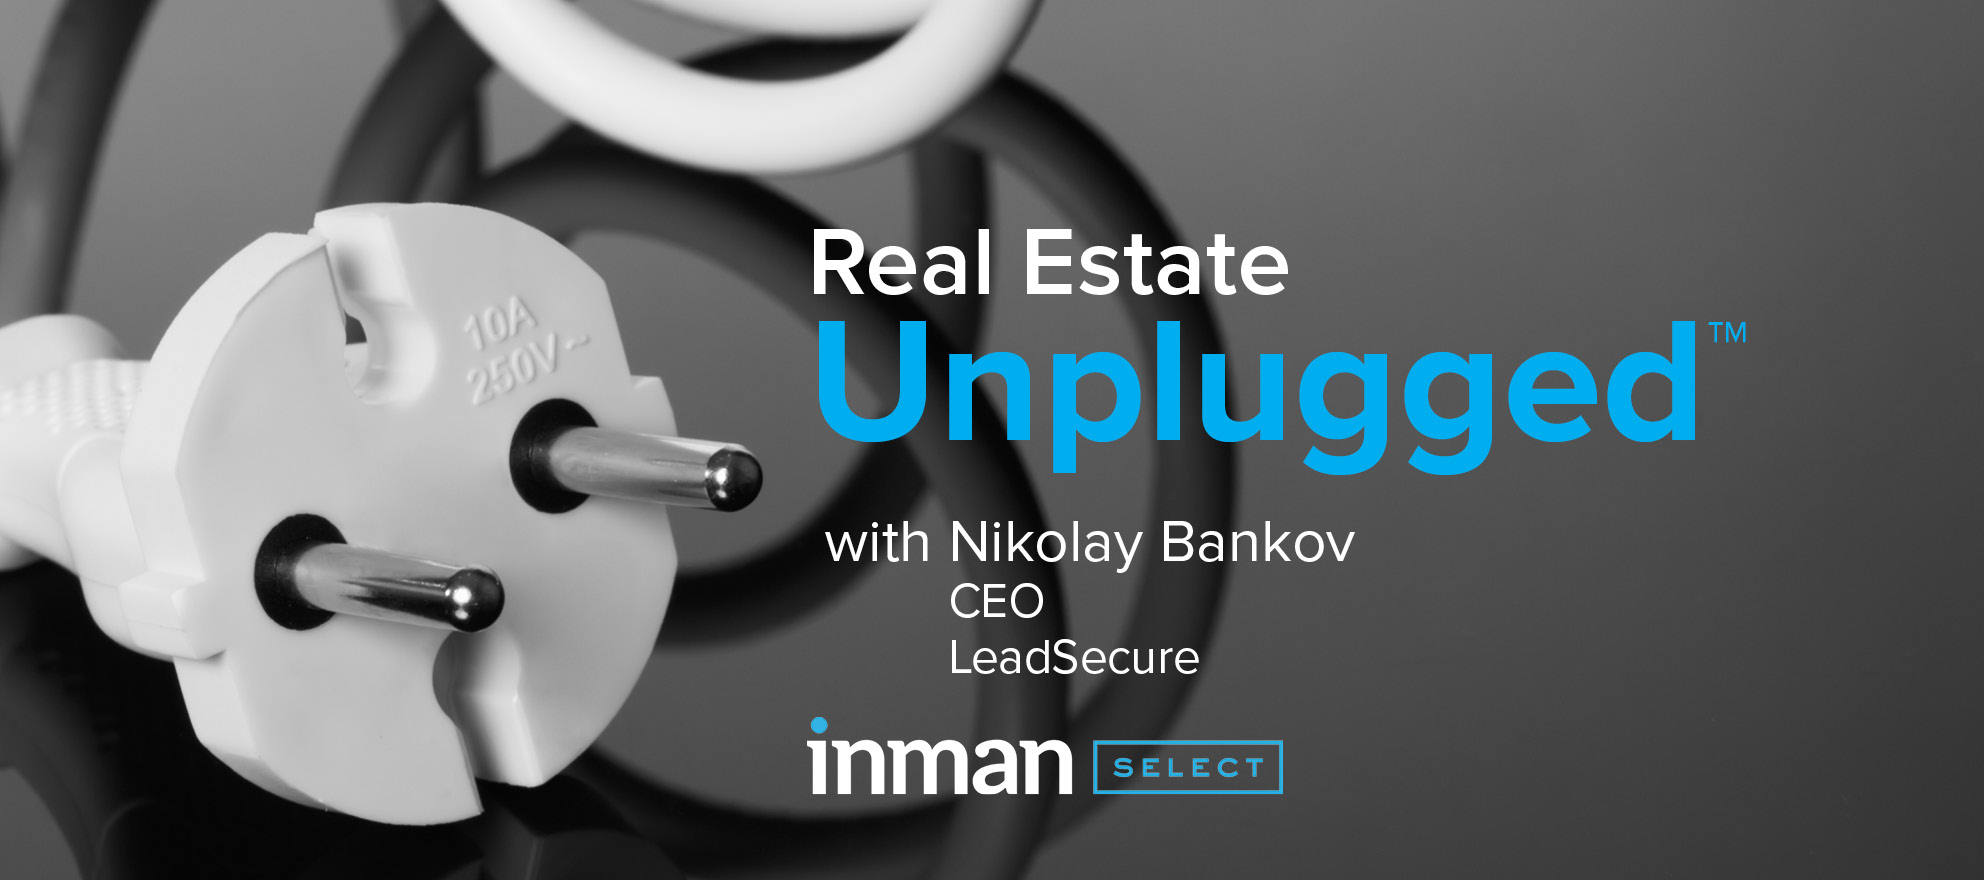 Nikolay Bankov on motivating through success and more